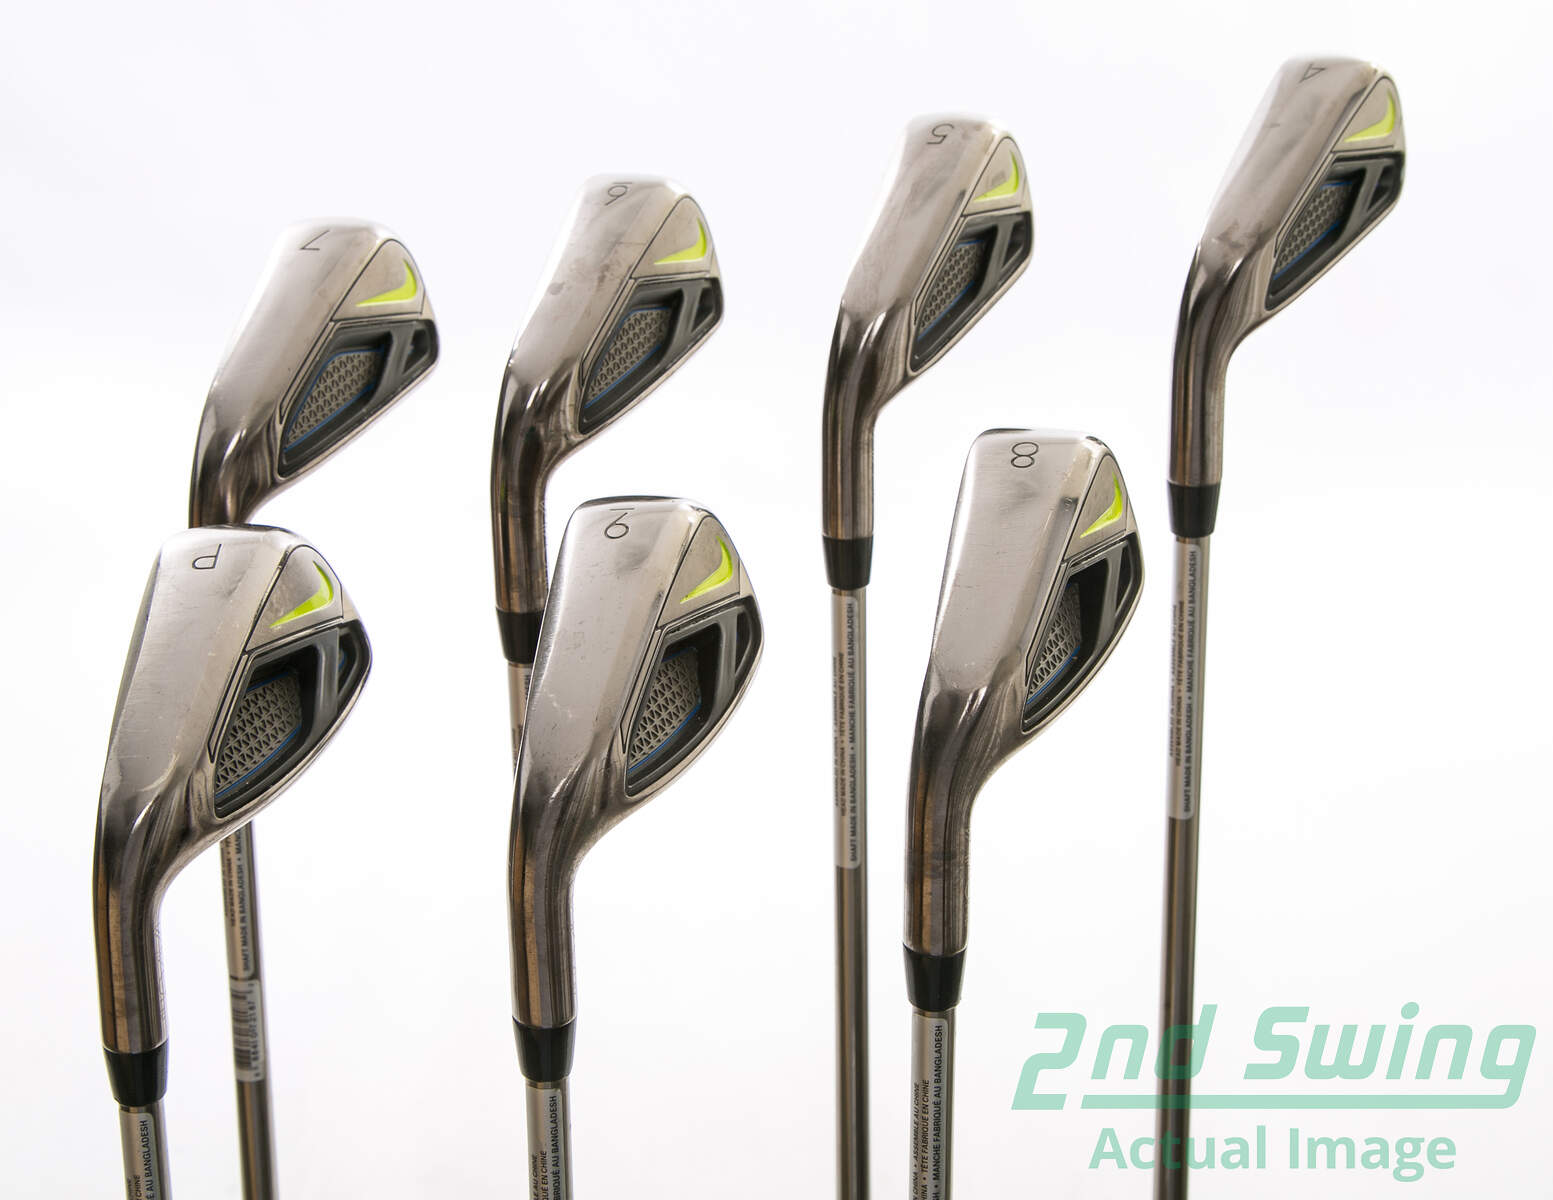 Nike Vapor Fly Iron Set 4-PW UST Mamiya Recoil 460 F4 Graphite Stiff Left  Handed 38